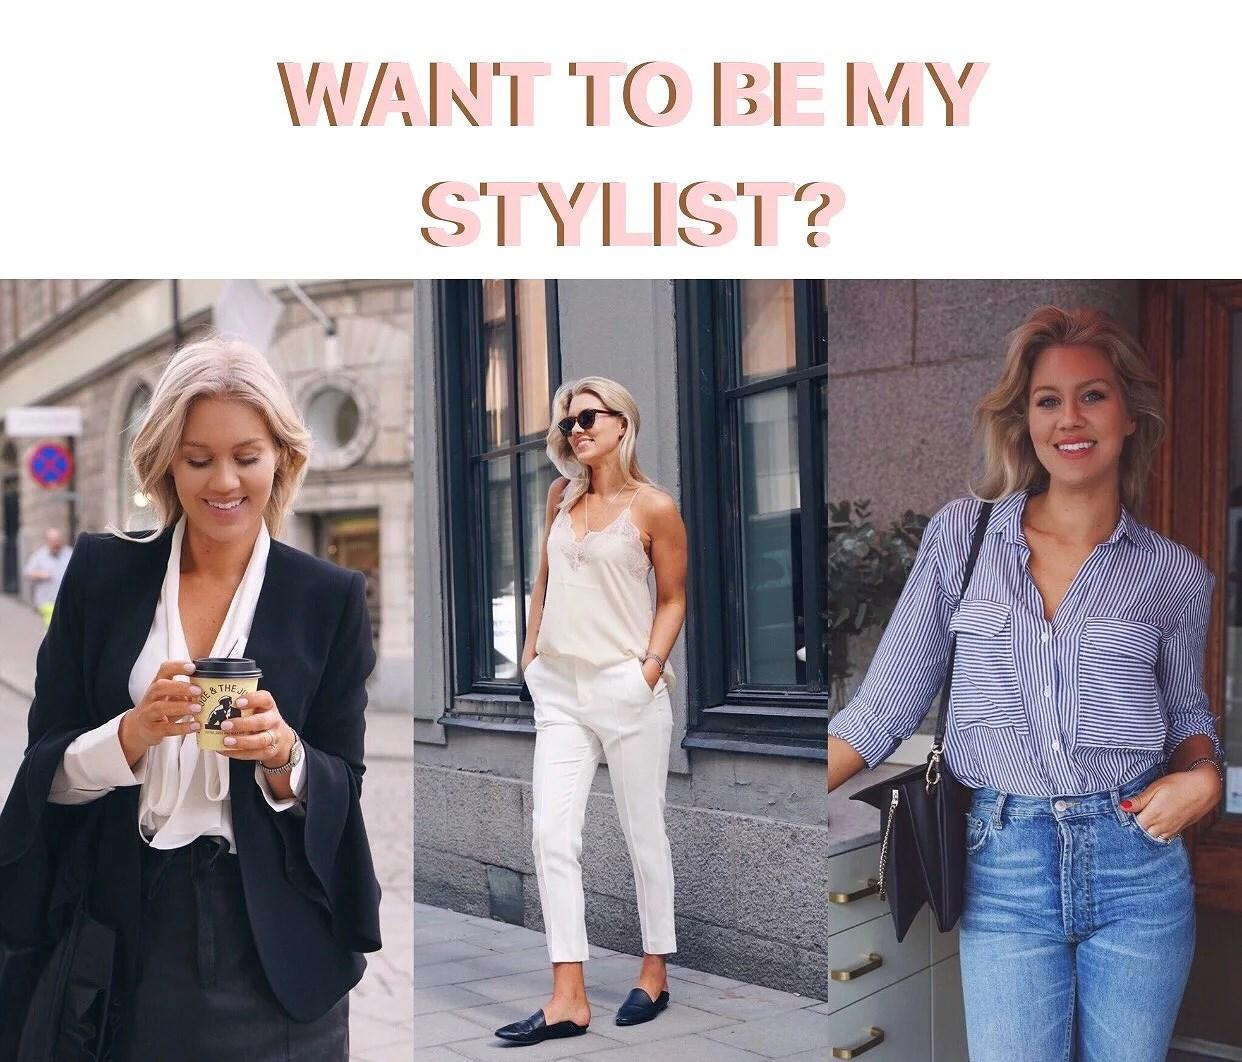 Vill bli Stylist? Look here!